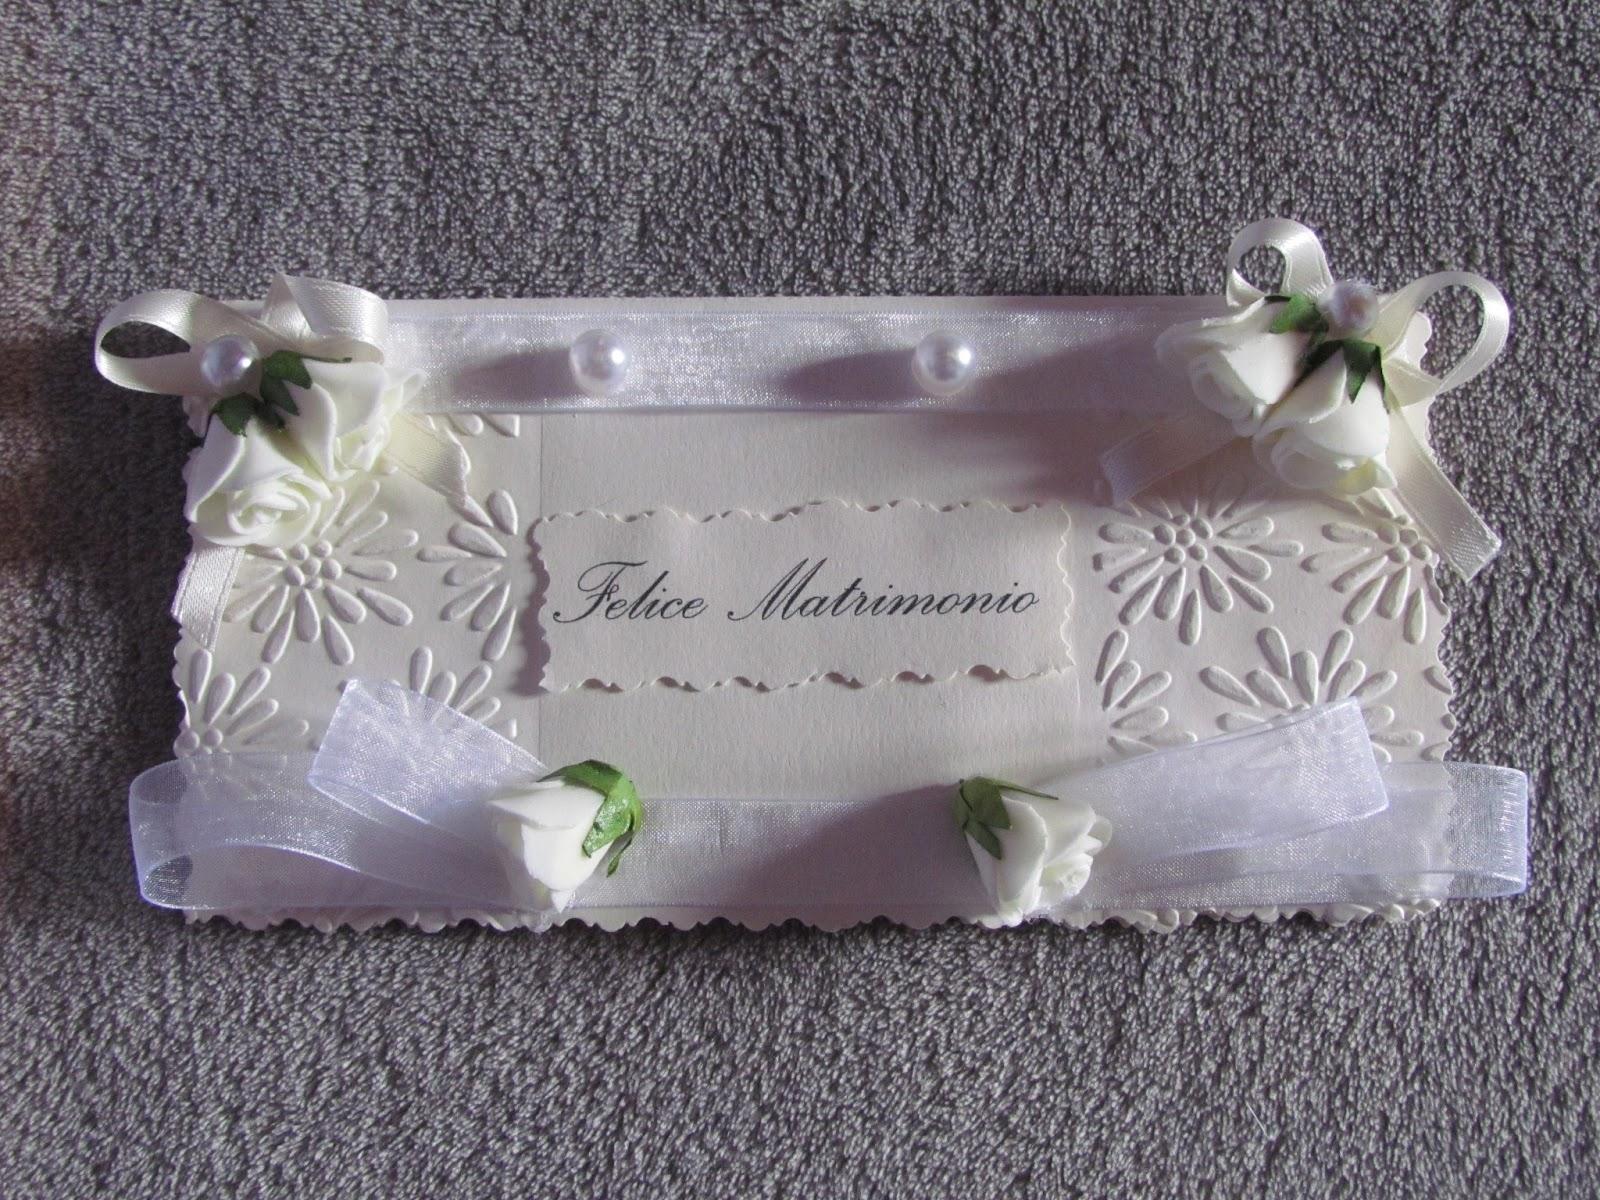 Auguri Matrimonio Vasco : Preziose raffinatezze biglietti auguri matrimonio fai da te